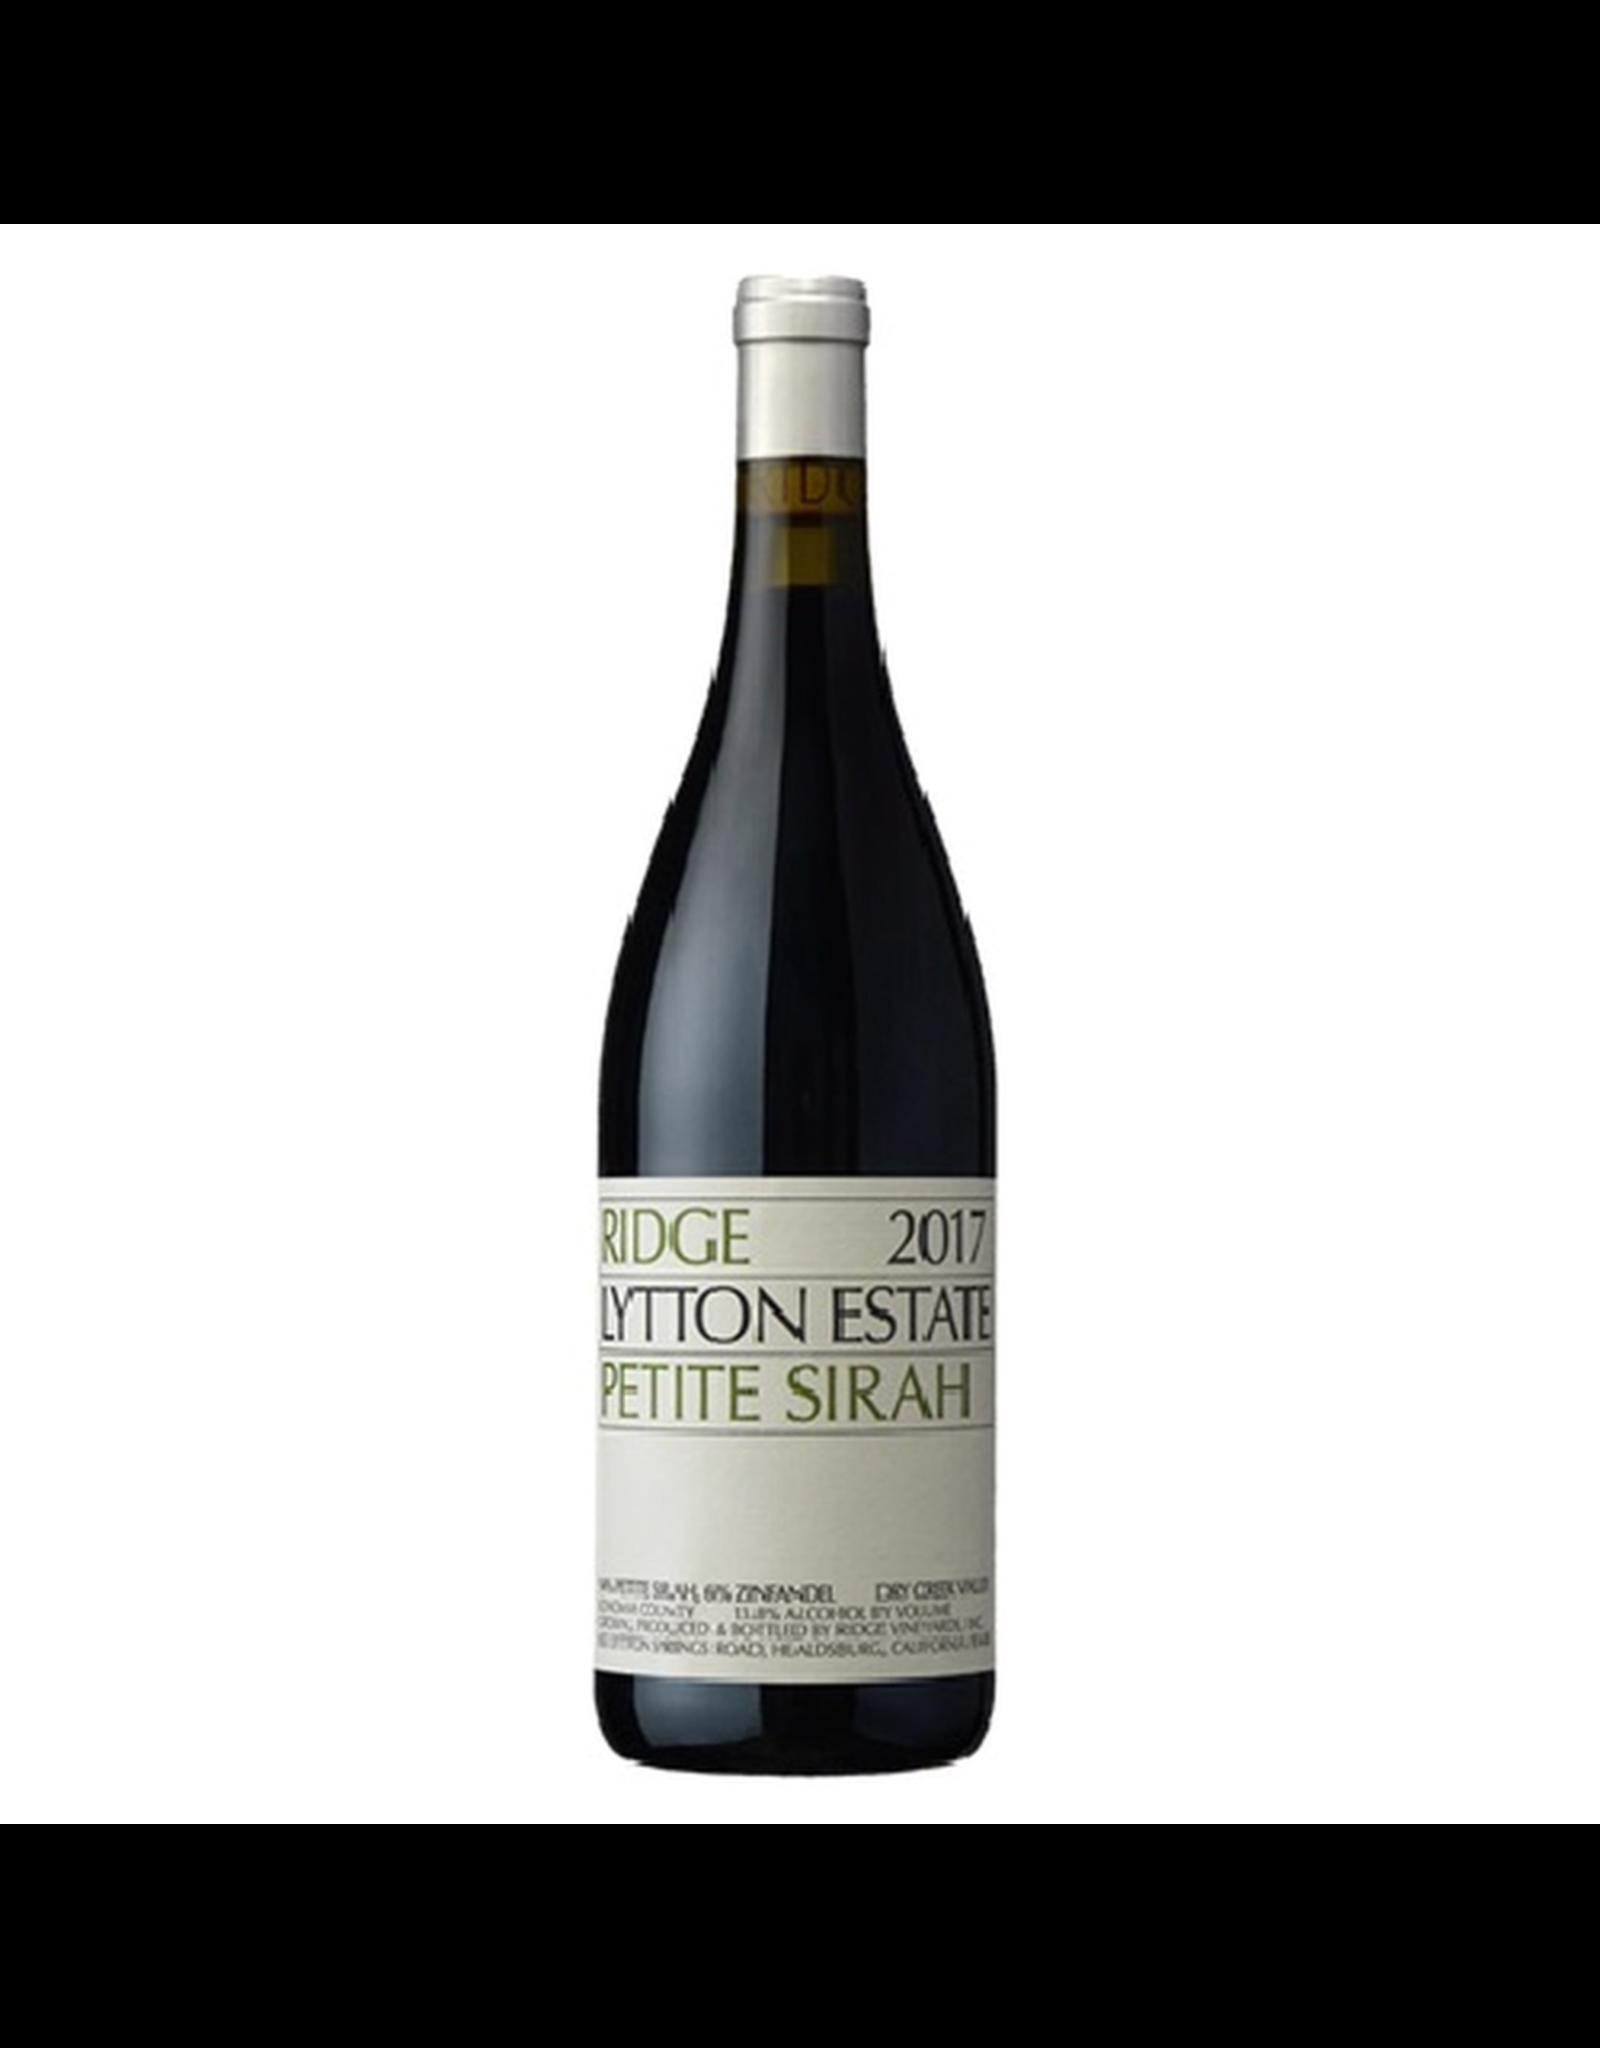 Red Wine 2017, Ridge Lytton Estate Vineyard, Petite Sirah, Dry Creek Valley, Sonoma County, California, 13.8% Alc, CT90